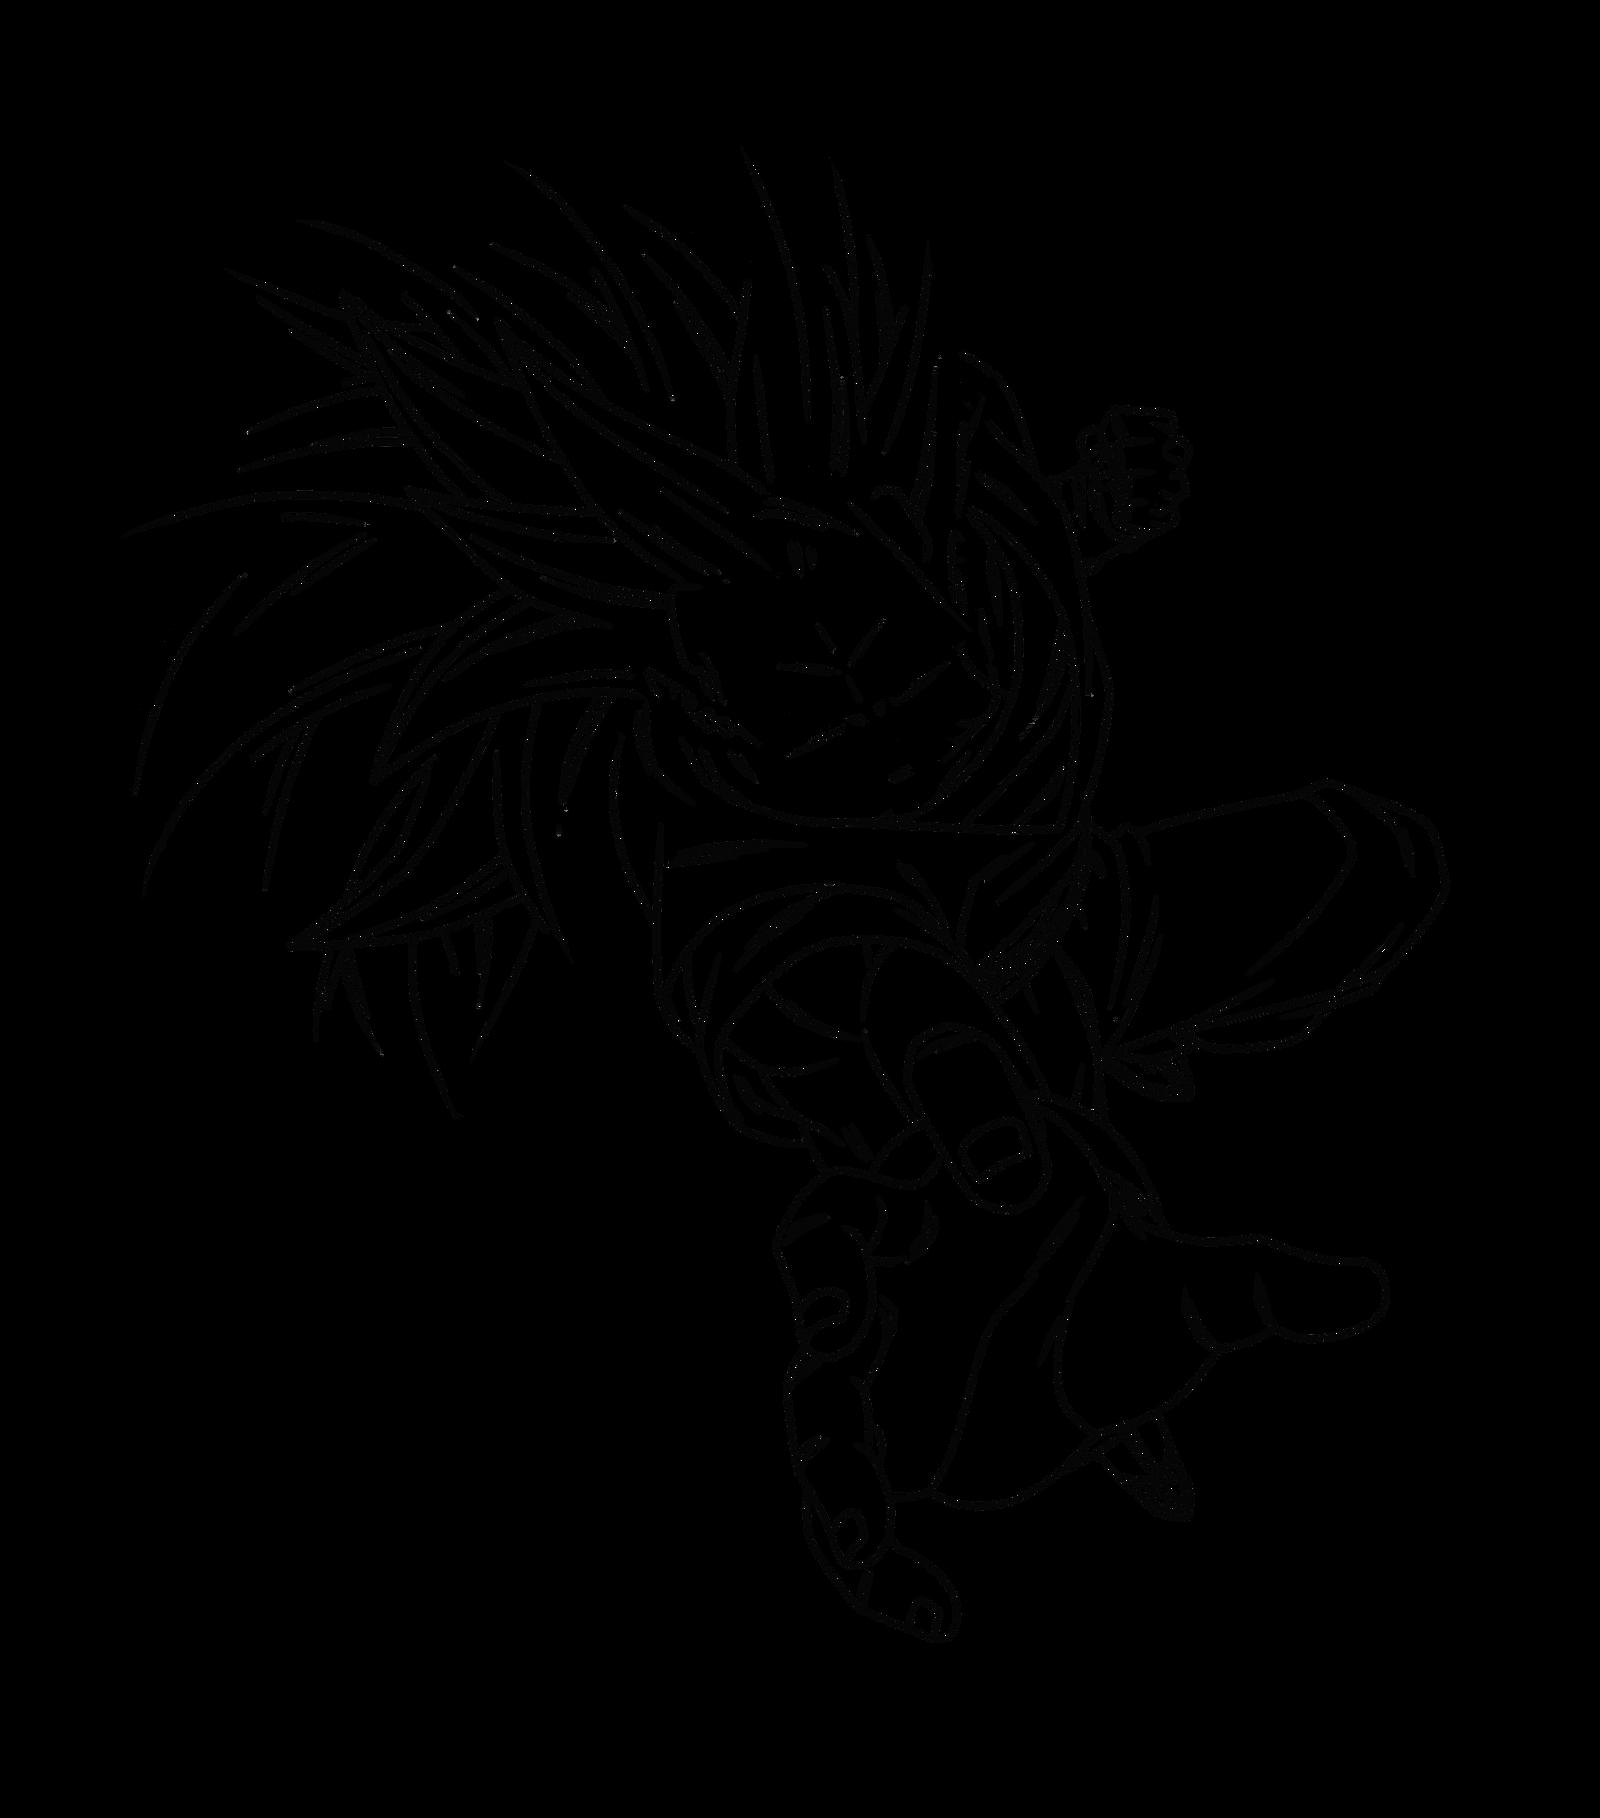 Vistoso Dbz Goku Ssj4 Para Colorear Adorno - Dibujos Para Colorear ...